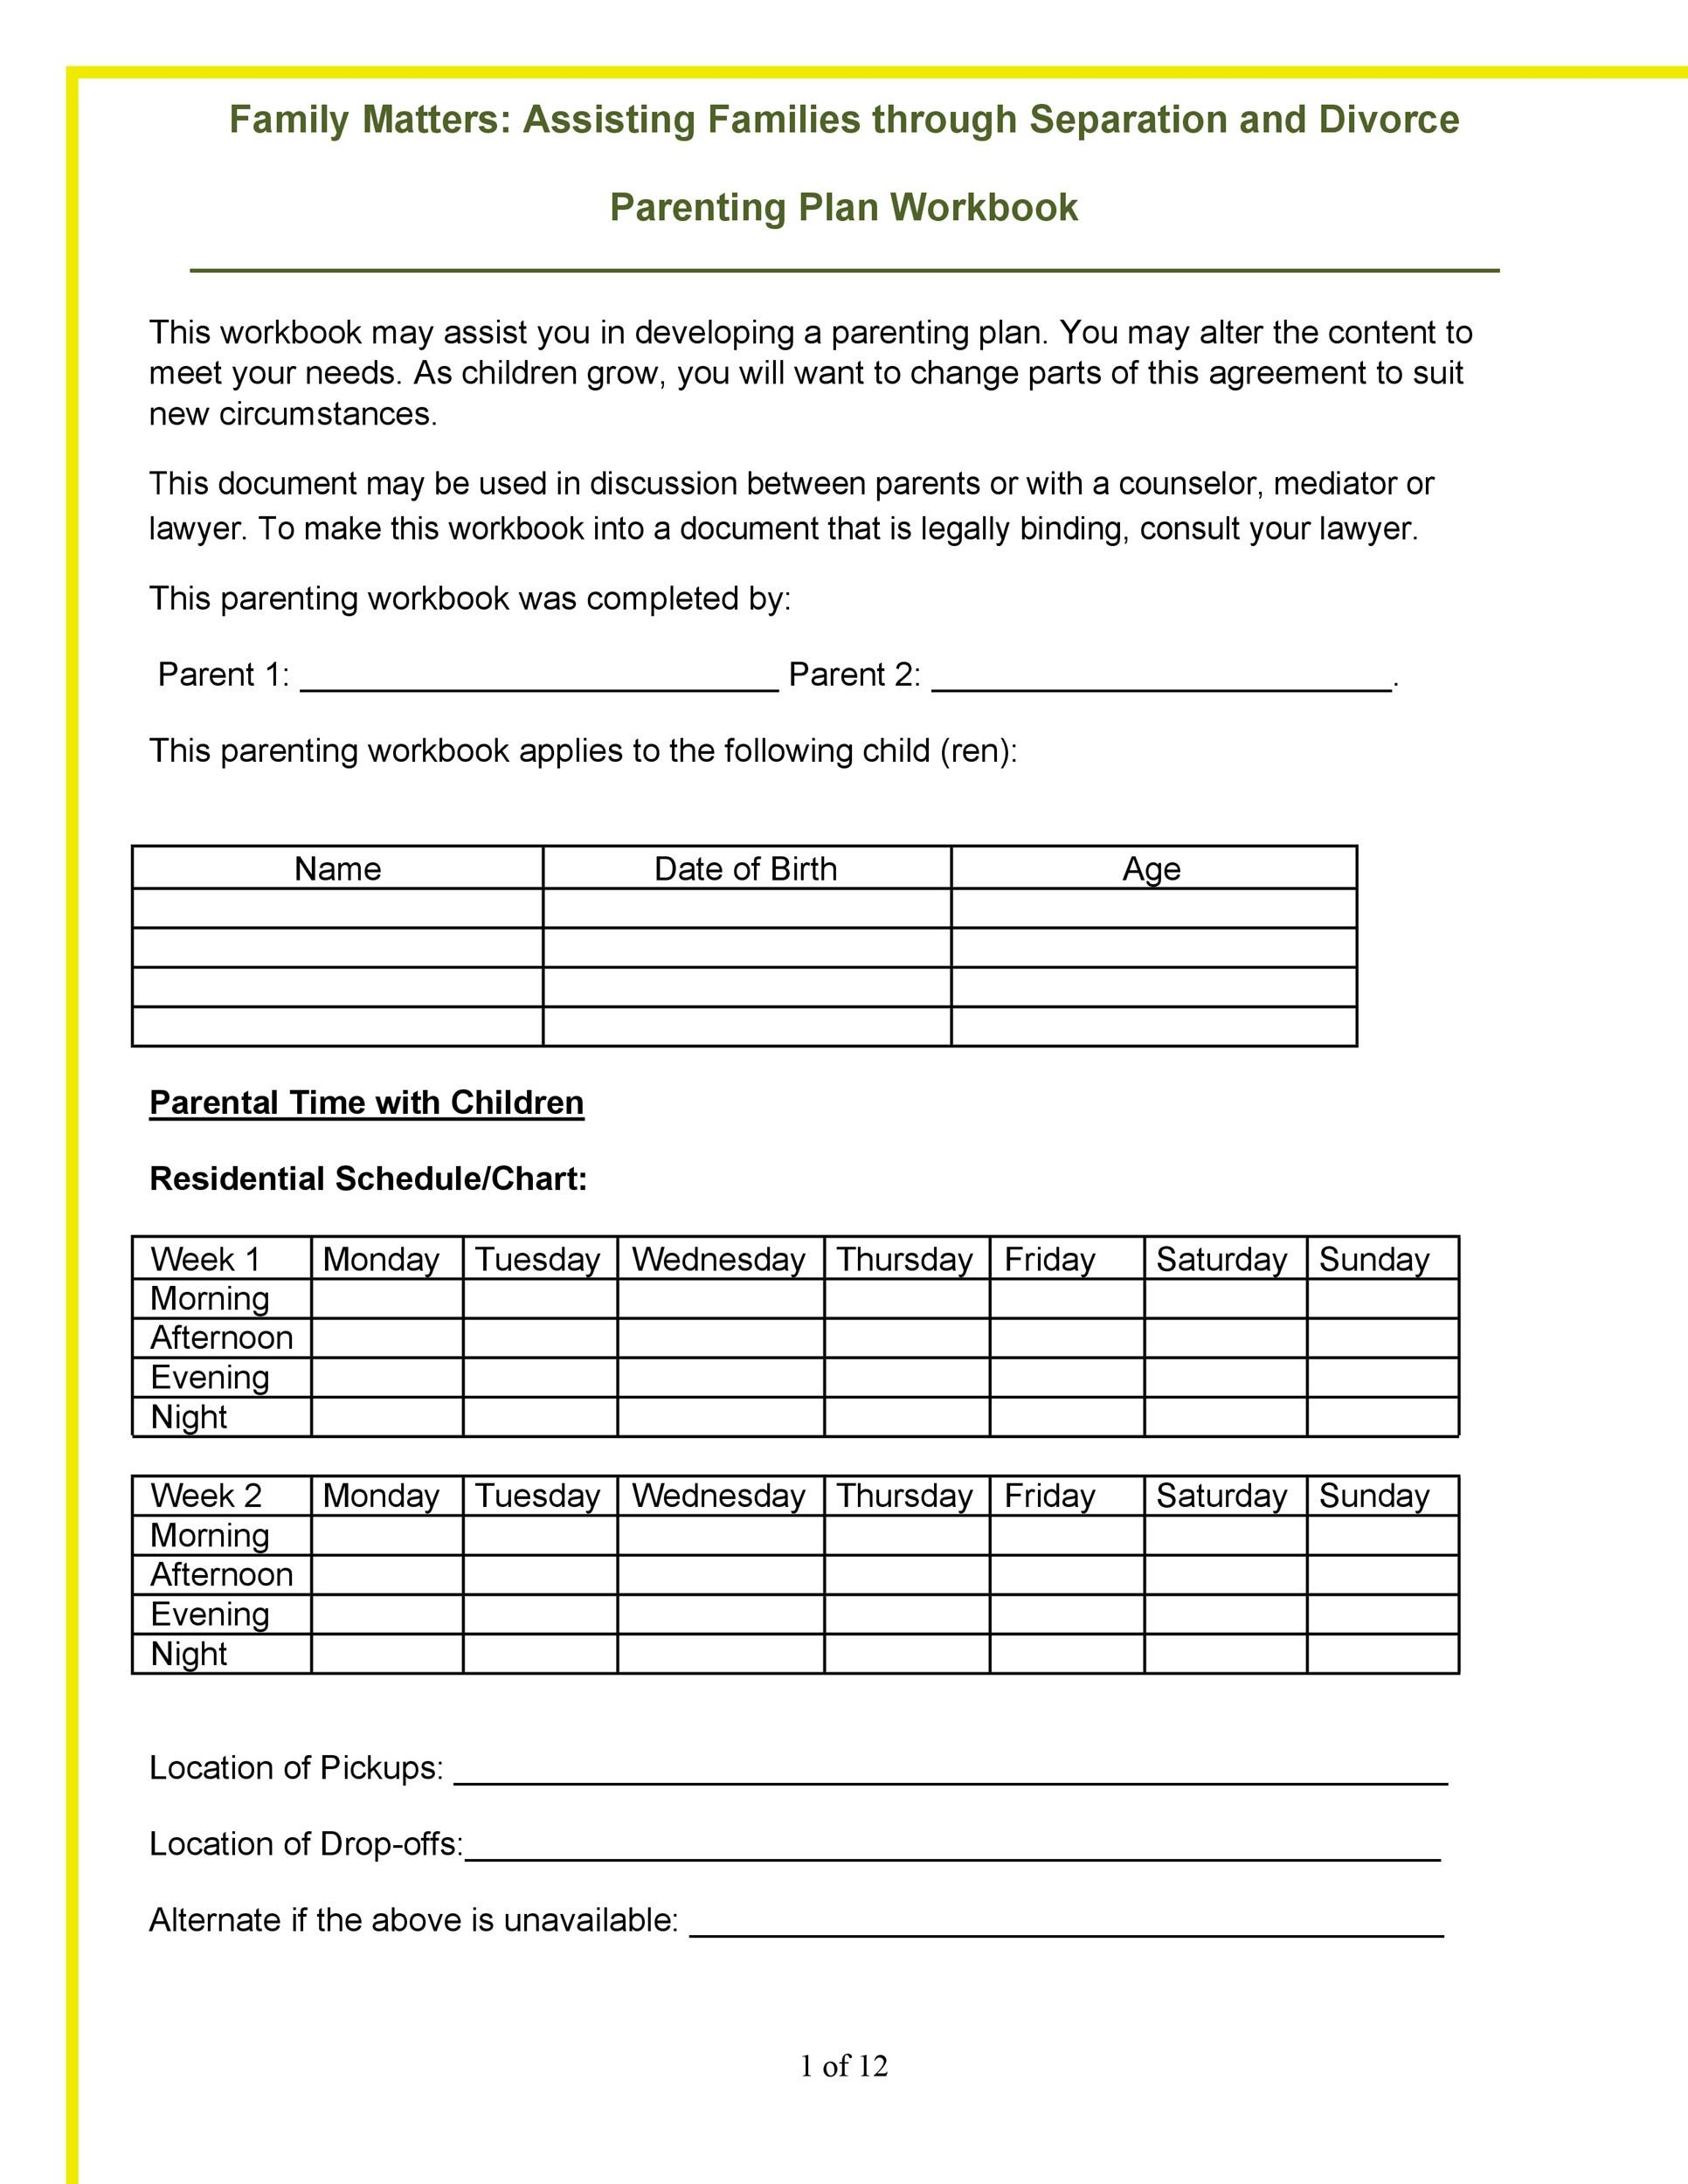 Free parenting plan template 03